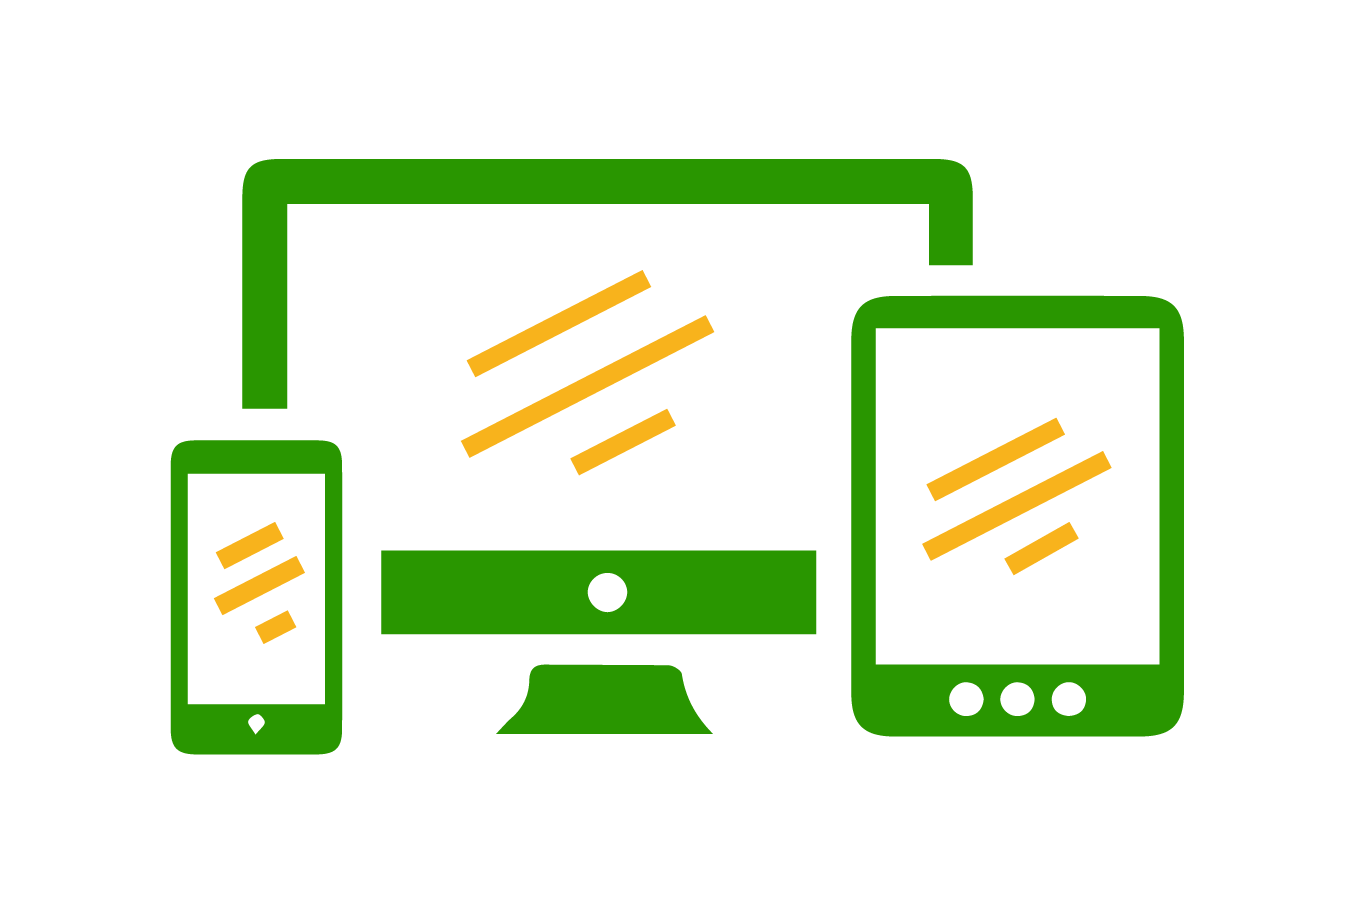 Responsive design across desktop, mobile, and tablet